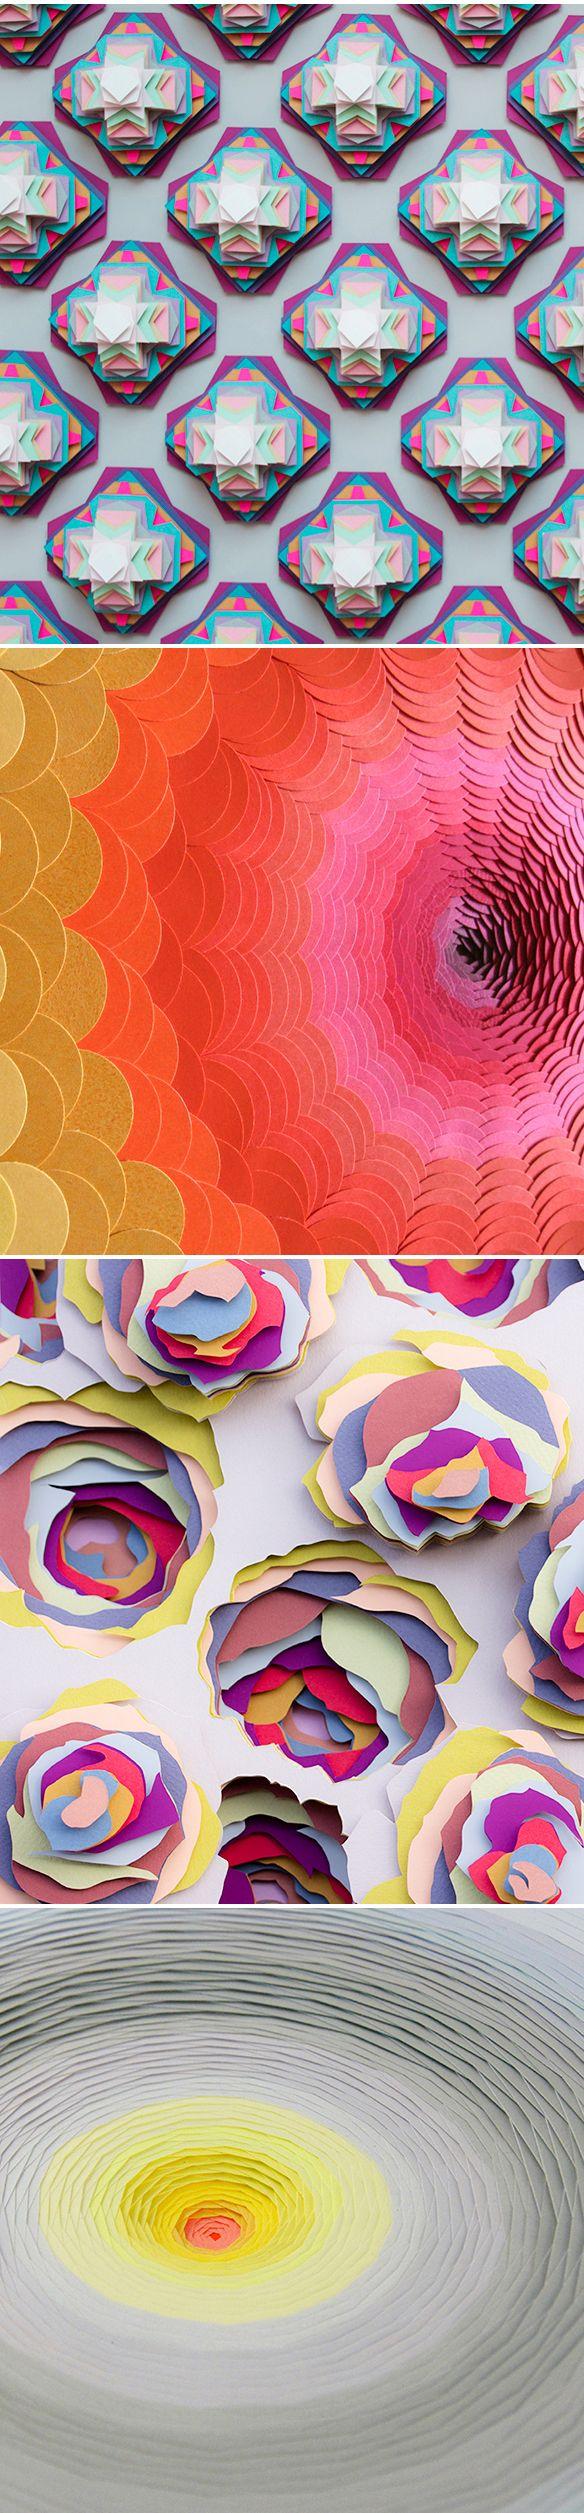 maud vantours - paper sculpture